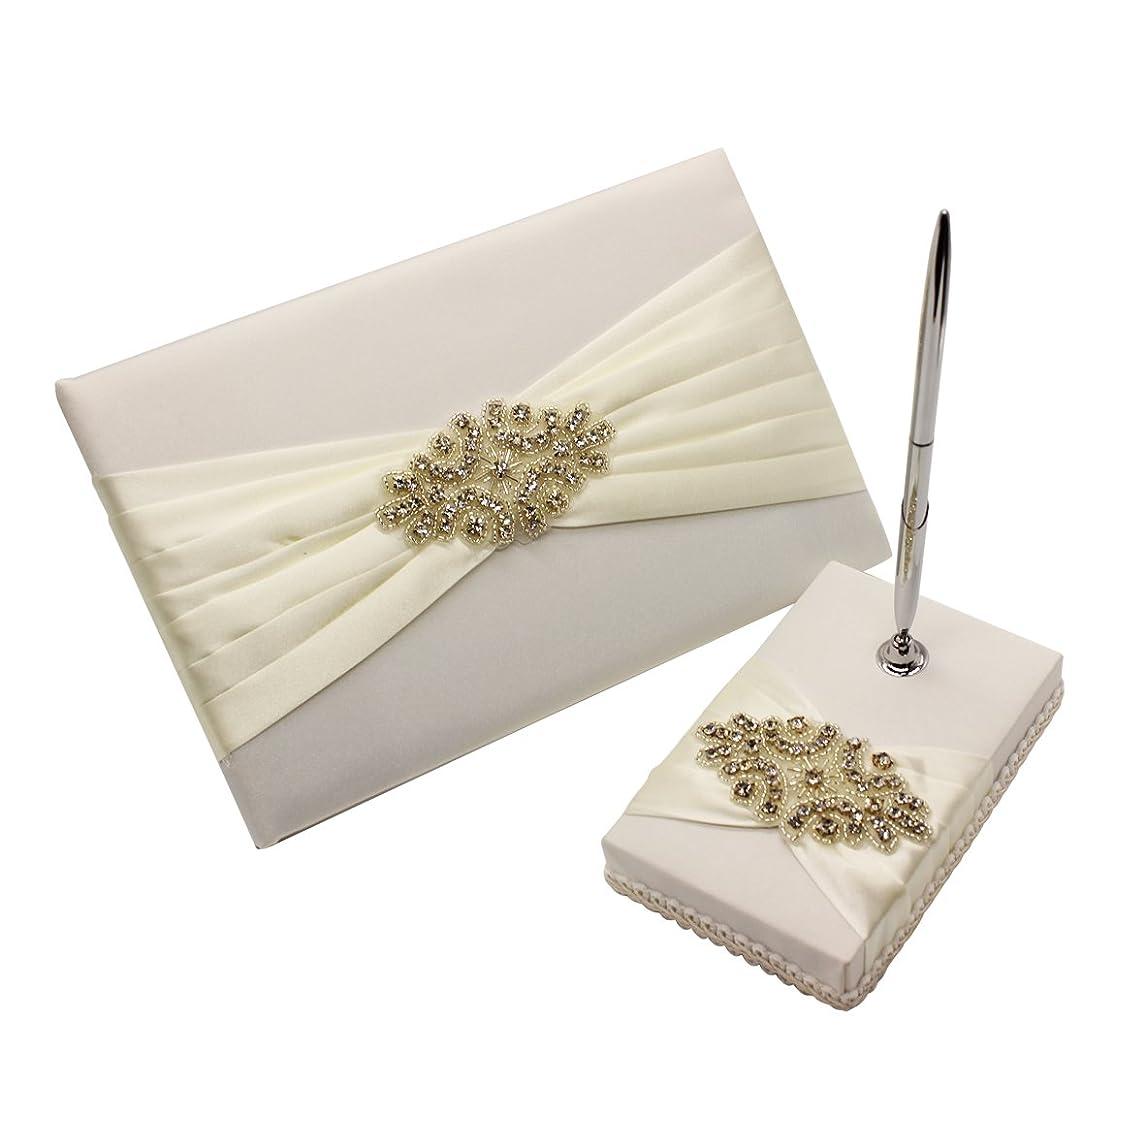 Meiysh Satin Bow Rhinestone Flower White Base Wedding Accessories Guest Book and Pen Set with Rhinestone (Ivory White)